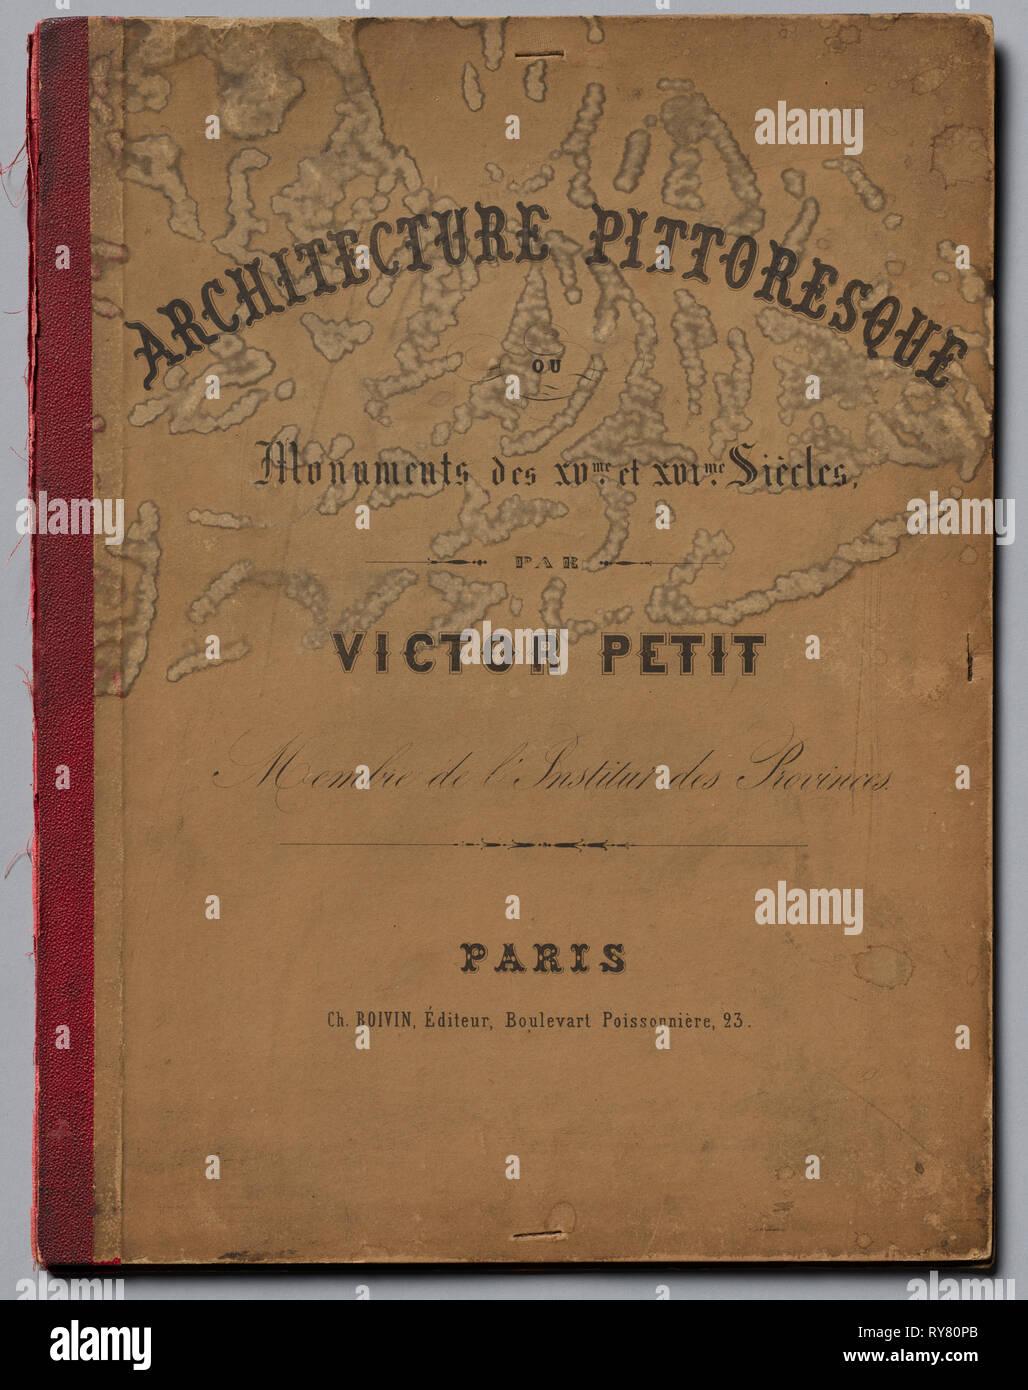 Architecture Pittoresque ou Monuments des XVeme. Et XVIeme. Siecles: Chateaux De France des XV et XVI Siecles, published 1860. Victor Petit (French, 1817-1874), Charles Boivin (publisher and editor); Lith de Godard a Paris (printer). Portfolio of 100 lithographs with tint stone; cover: 37.5 x 29 cm (14 3/4 x 11 7/16 in Stock Photo